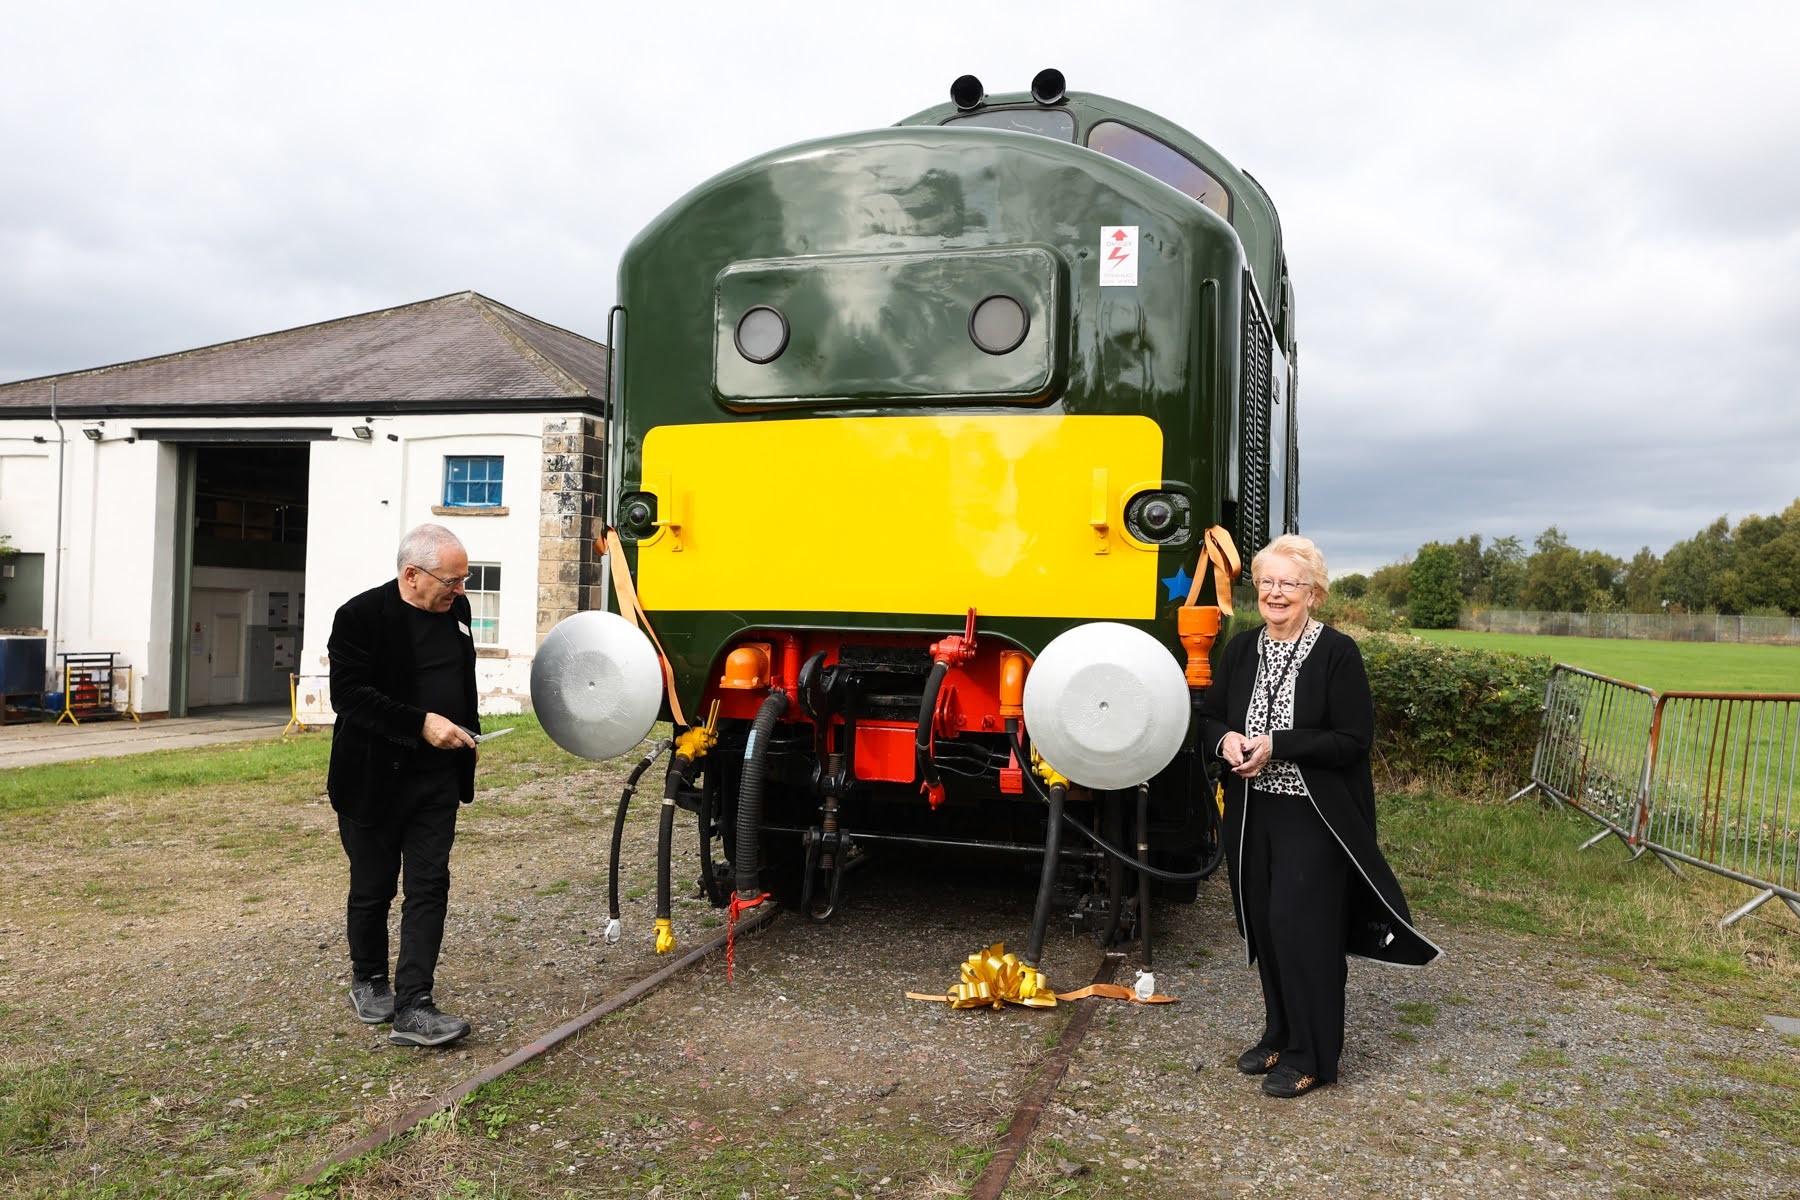 Historic locomotive returns to Darlington after 50 years away